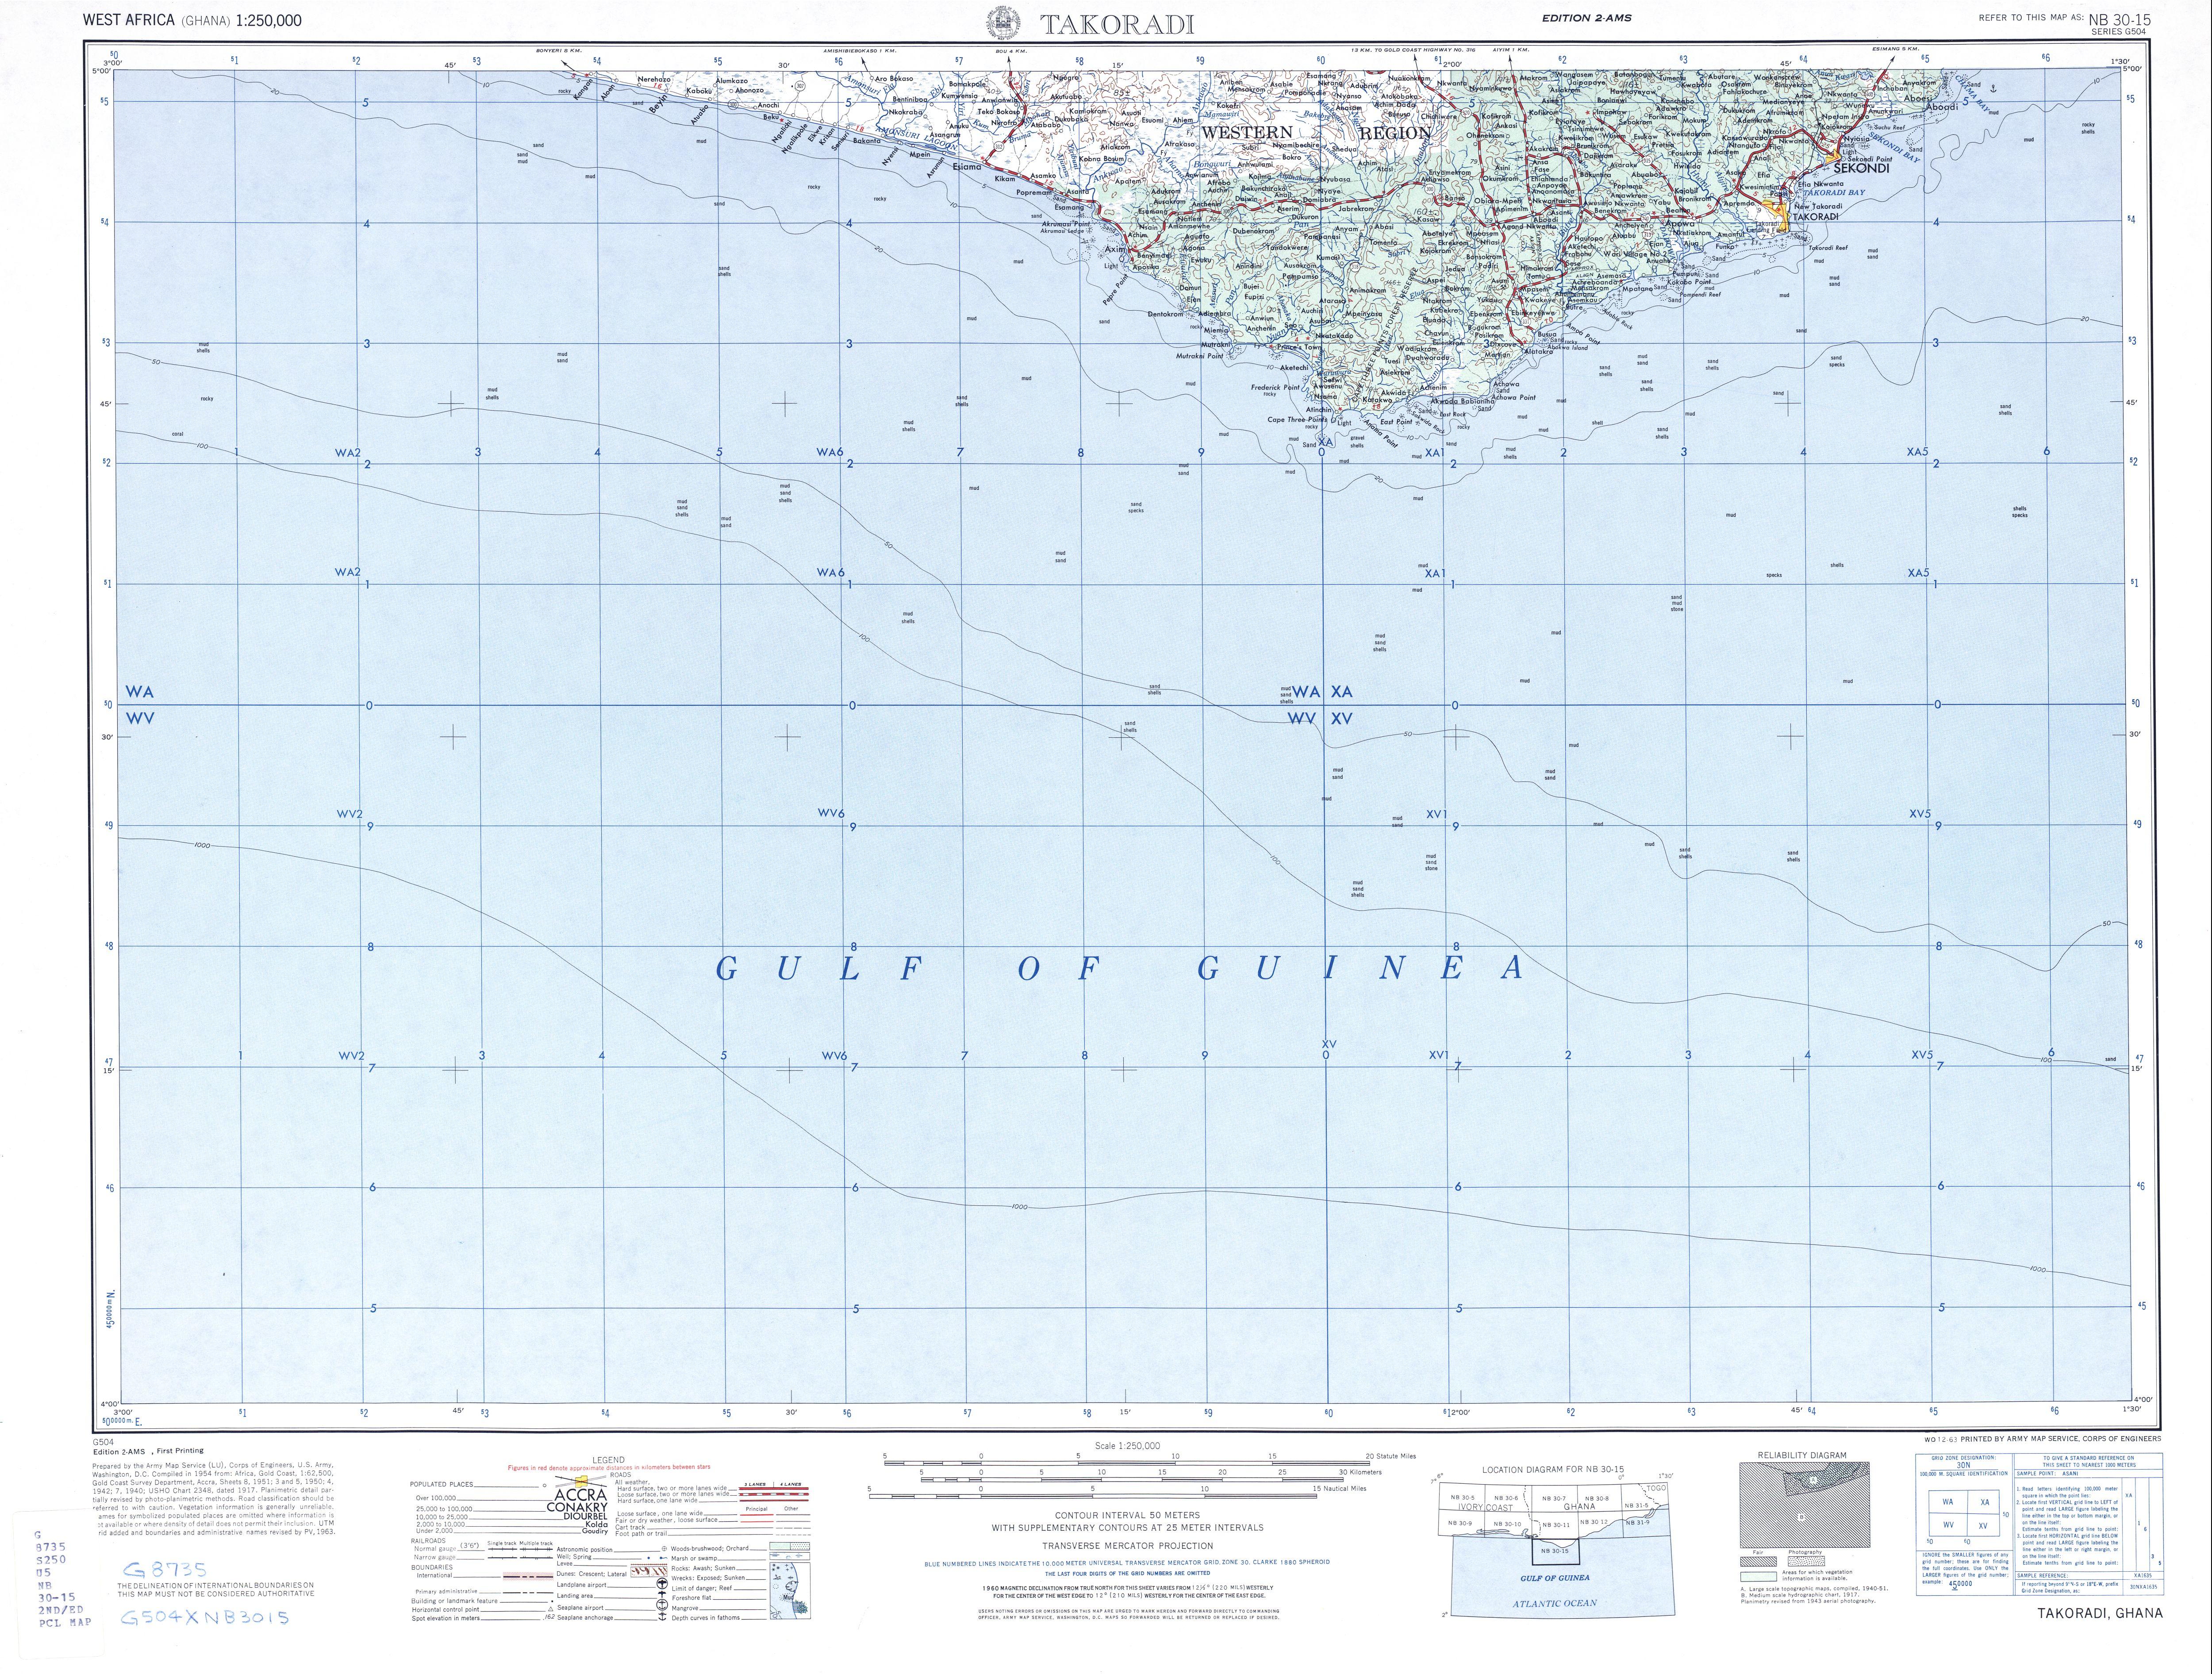 Hoja Takoradi del Mapa Topográfico de África Occidental 1955